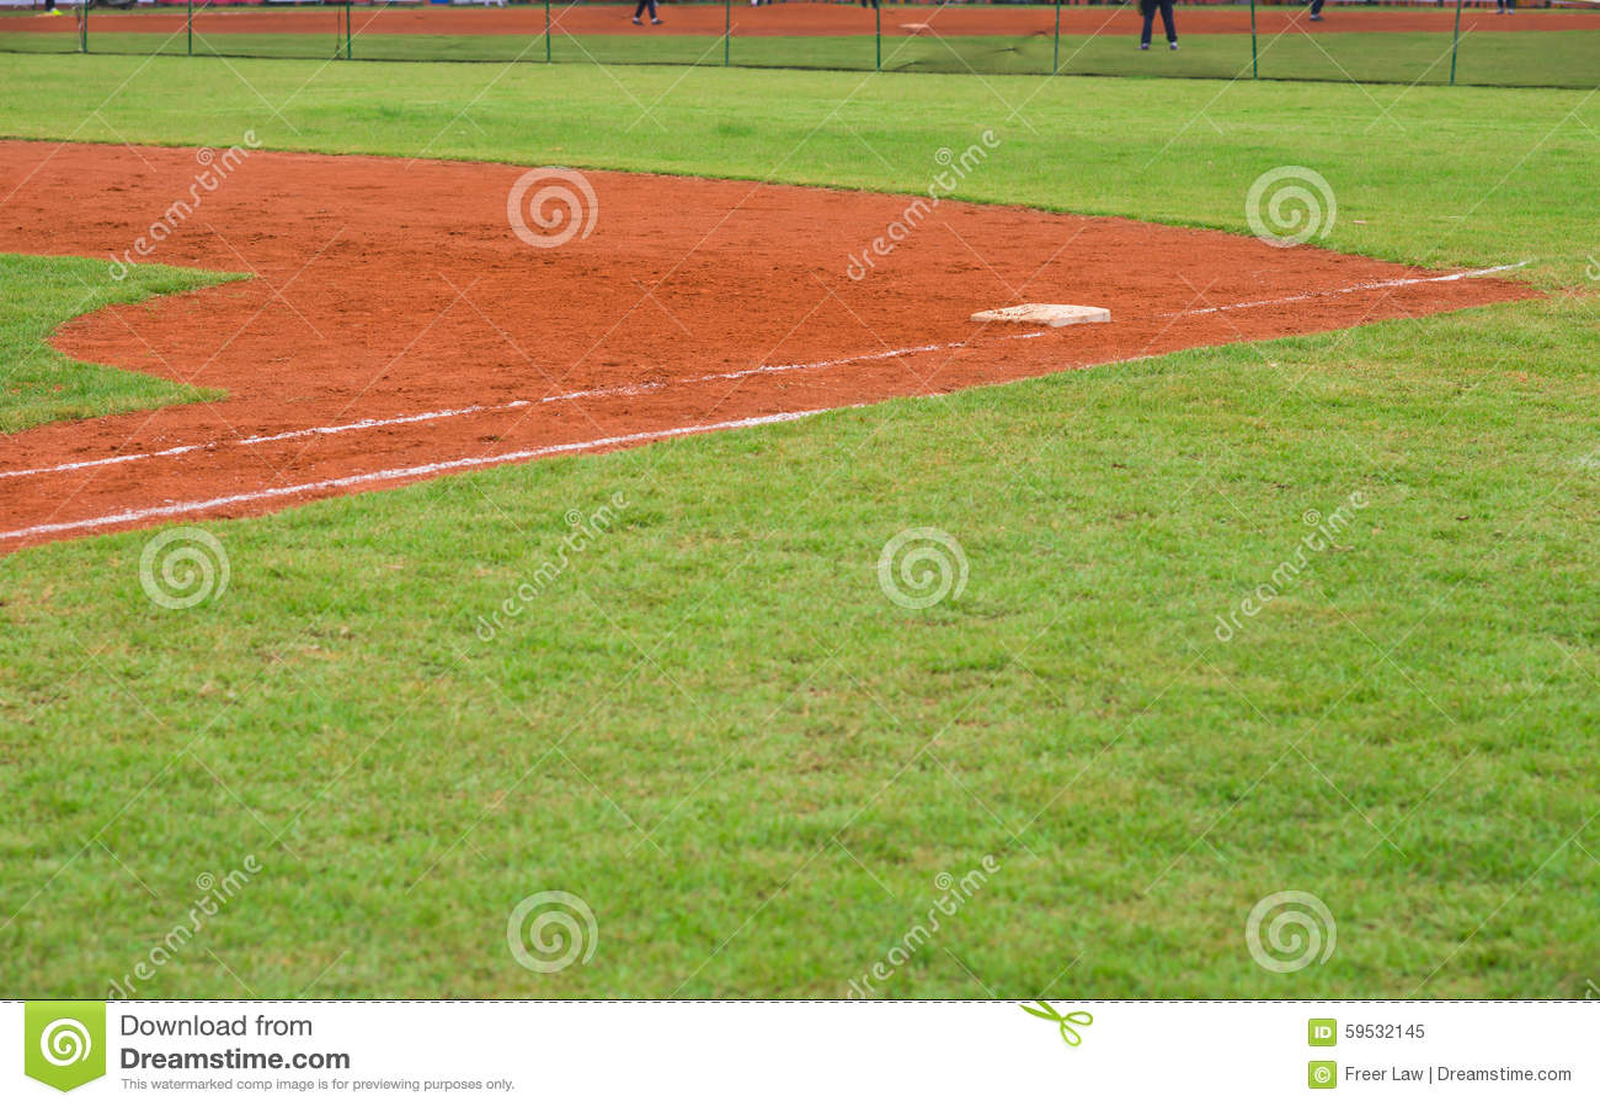 Corner of baseball field